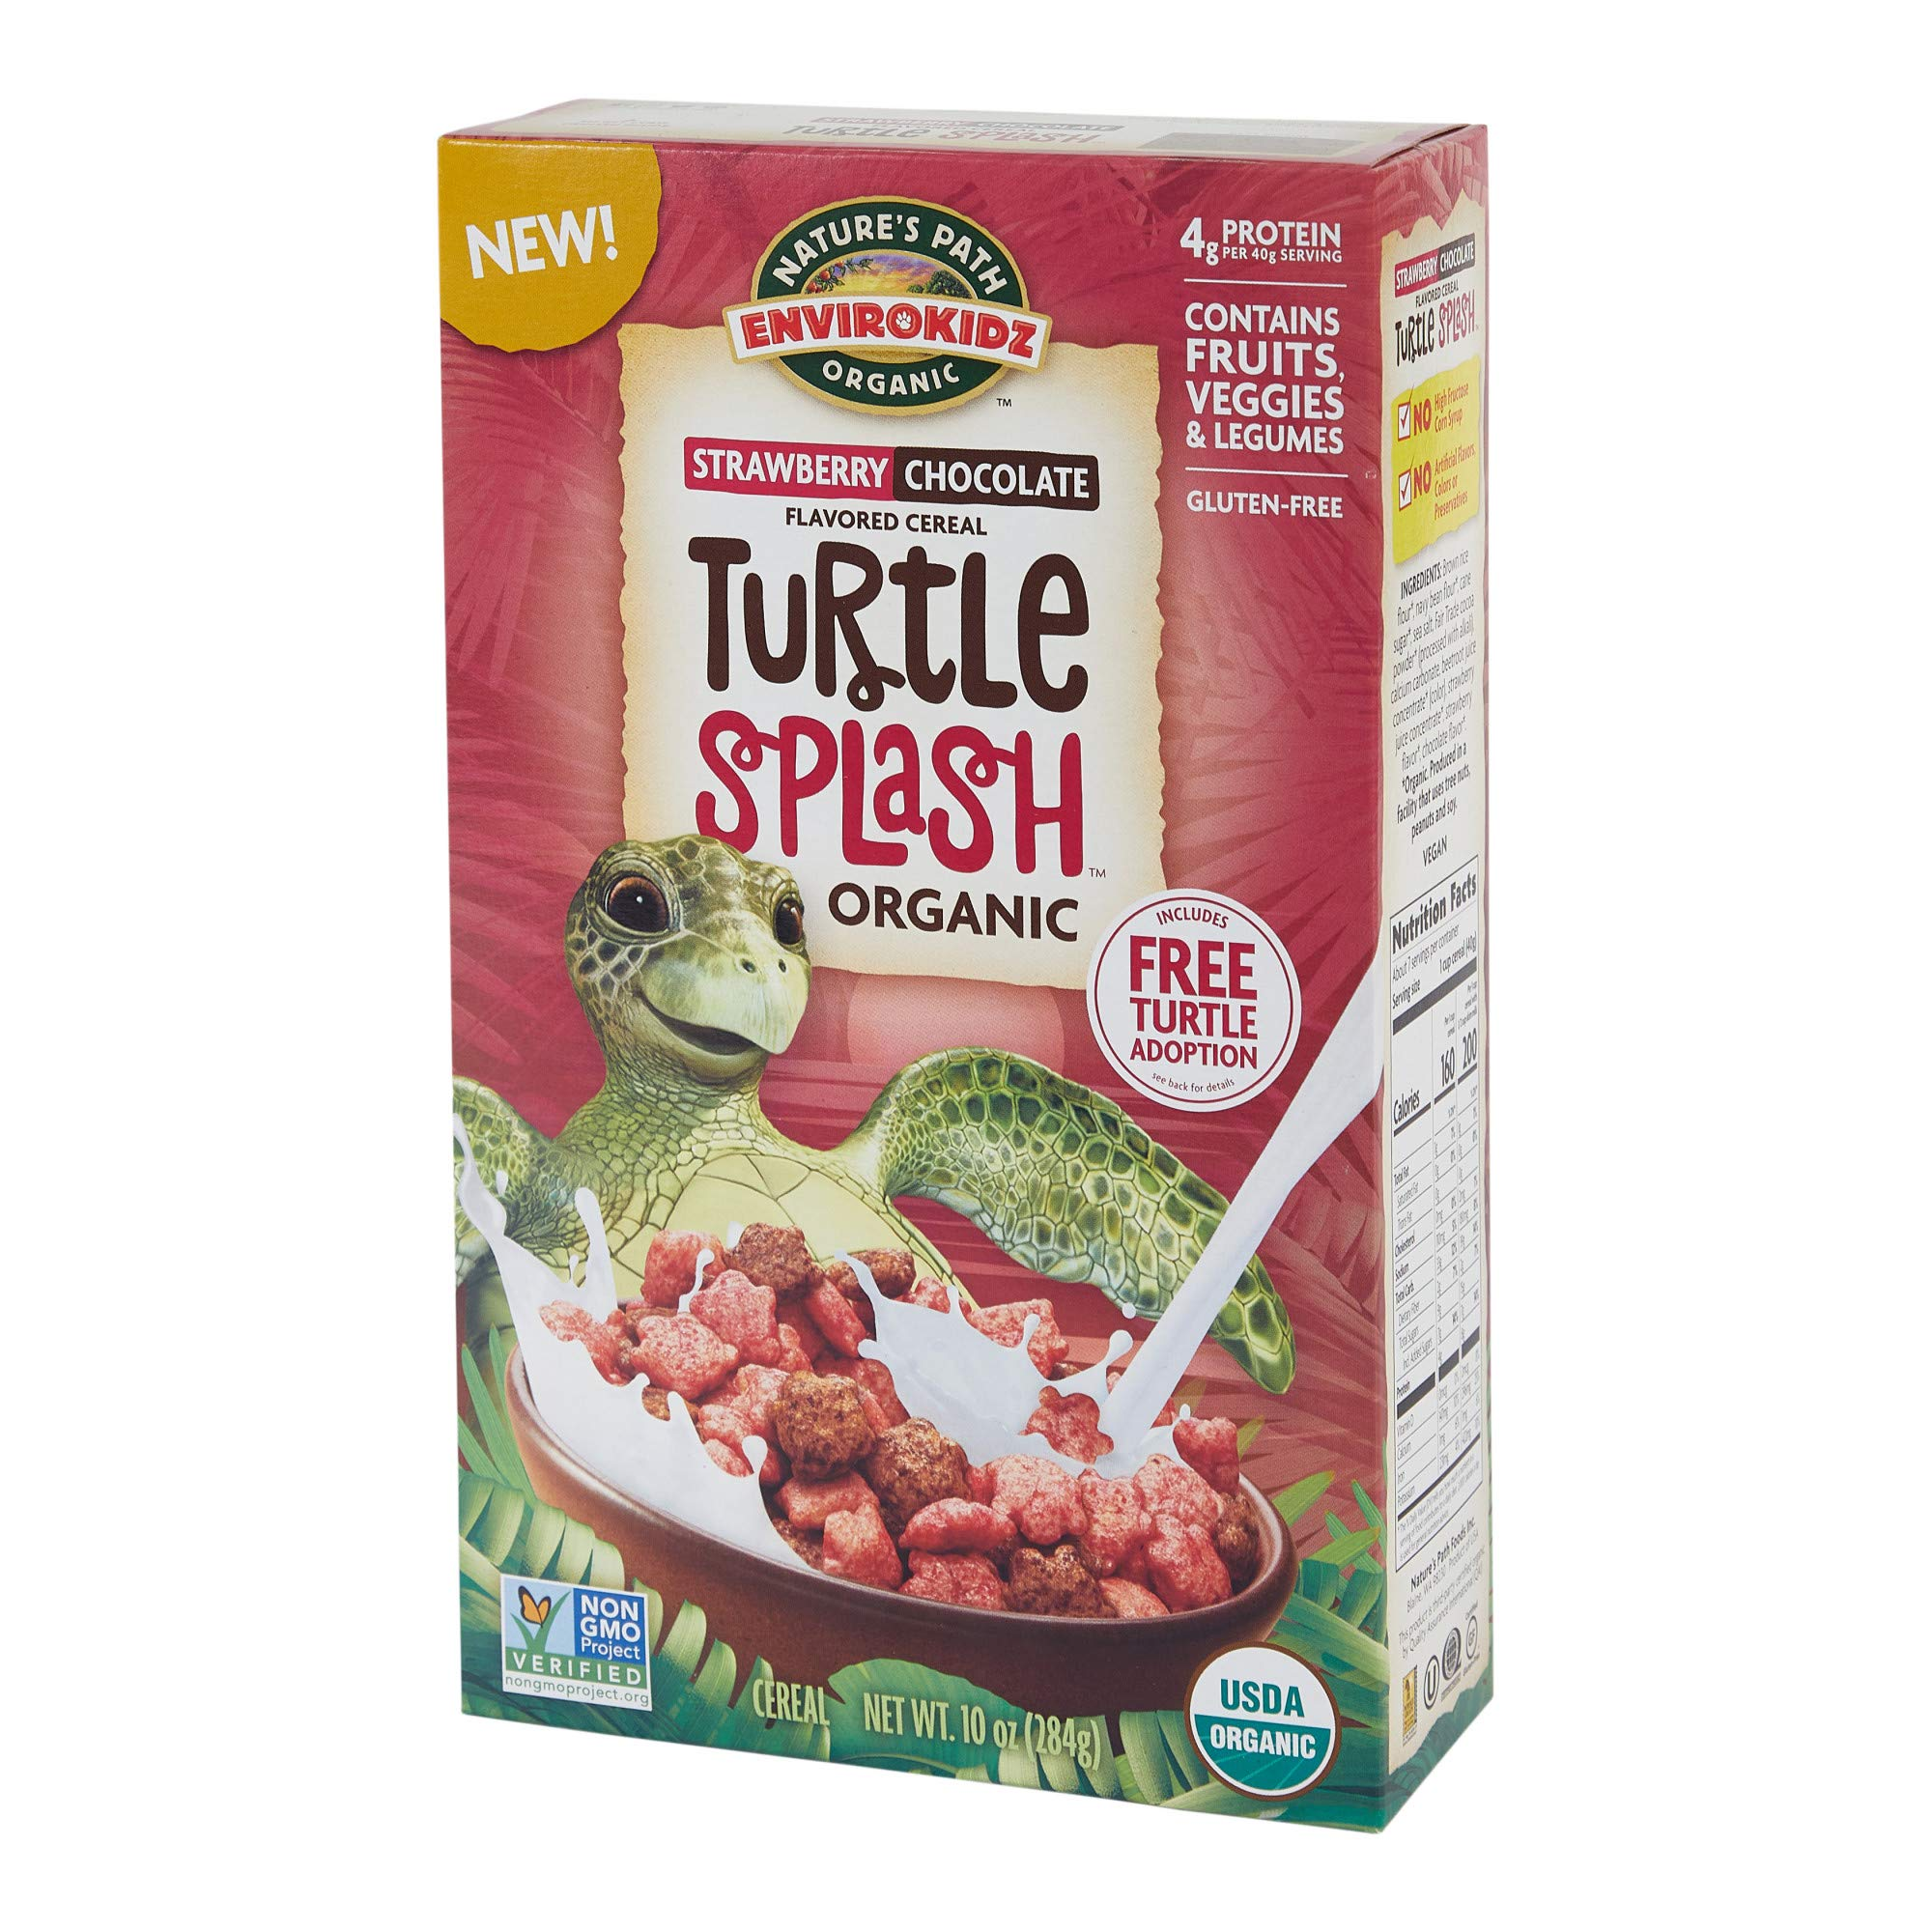 Nature's Path Envirokidz Organic Turtle Splash Cereal, 12 Count